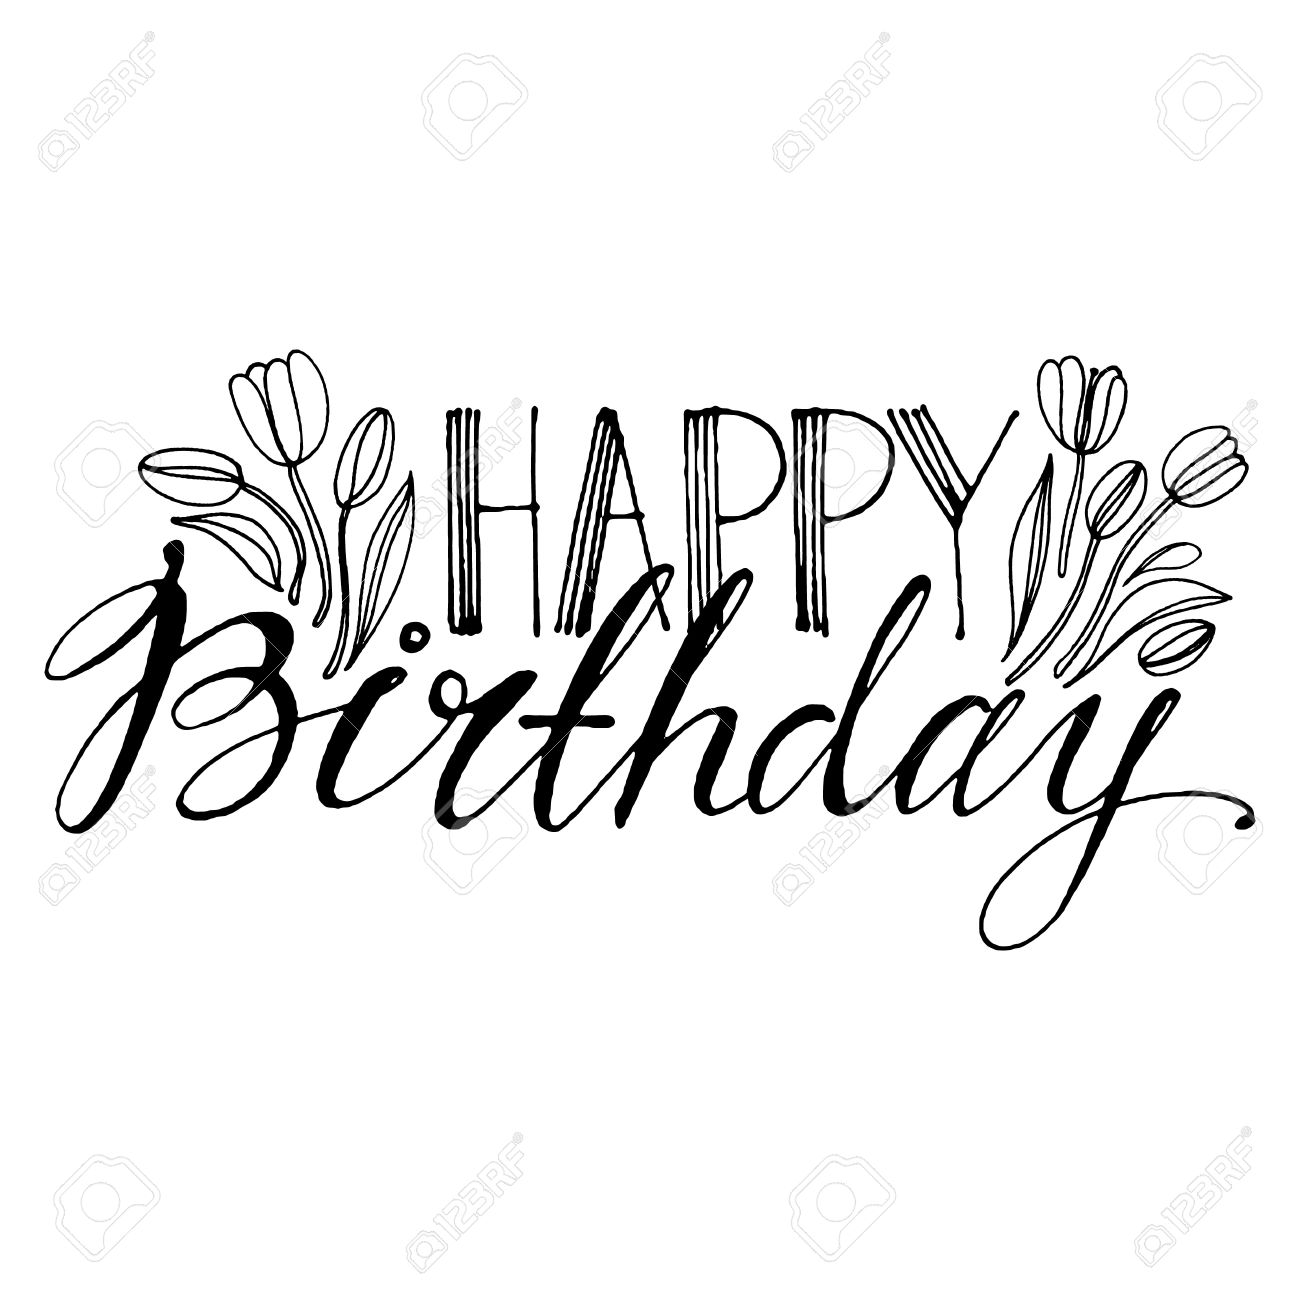 Hand drawn vector lettering words happy birthday with flowers hand drawn vector lettering words happy birthday with flowers by hand isolated vector illustration izmirmasajfo